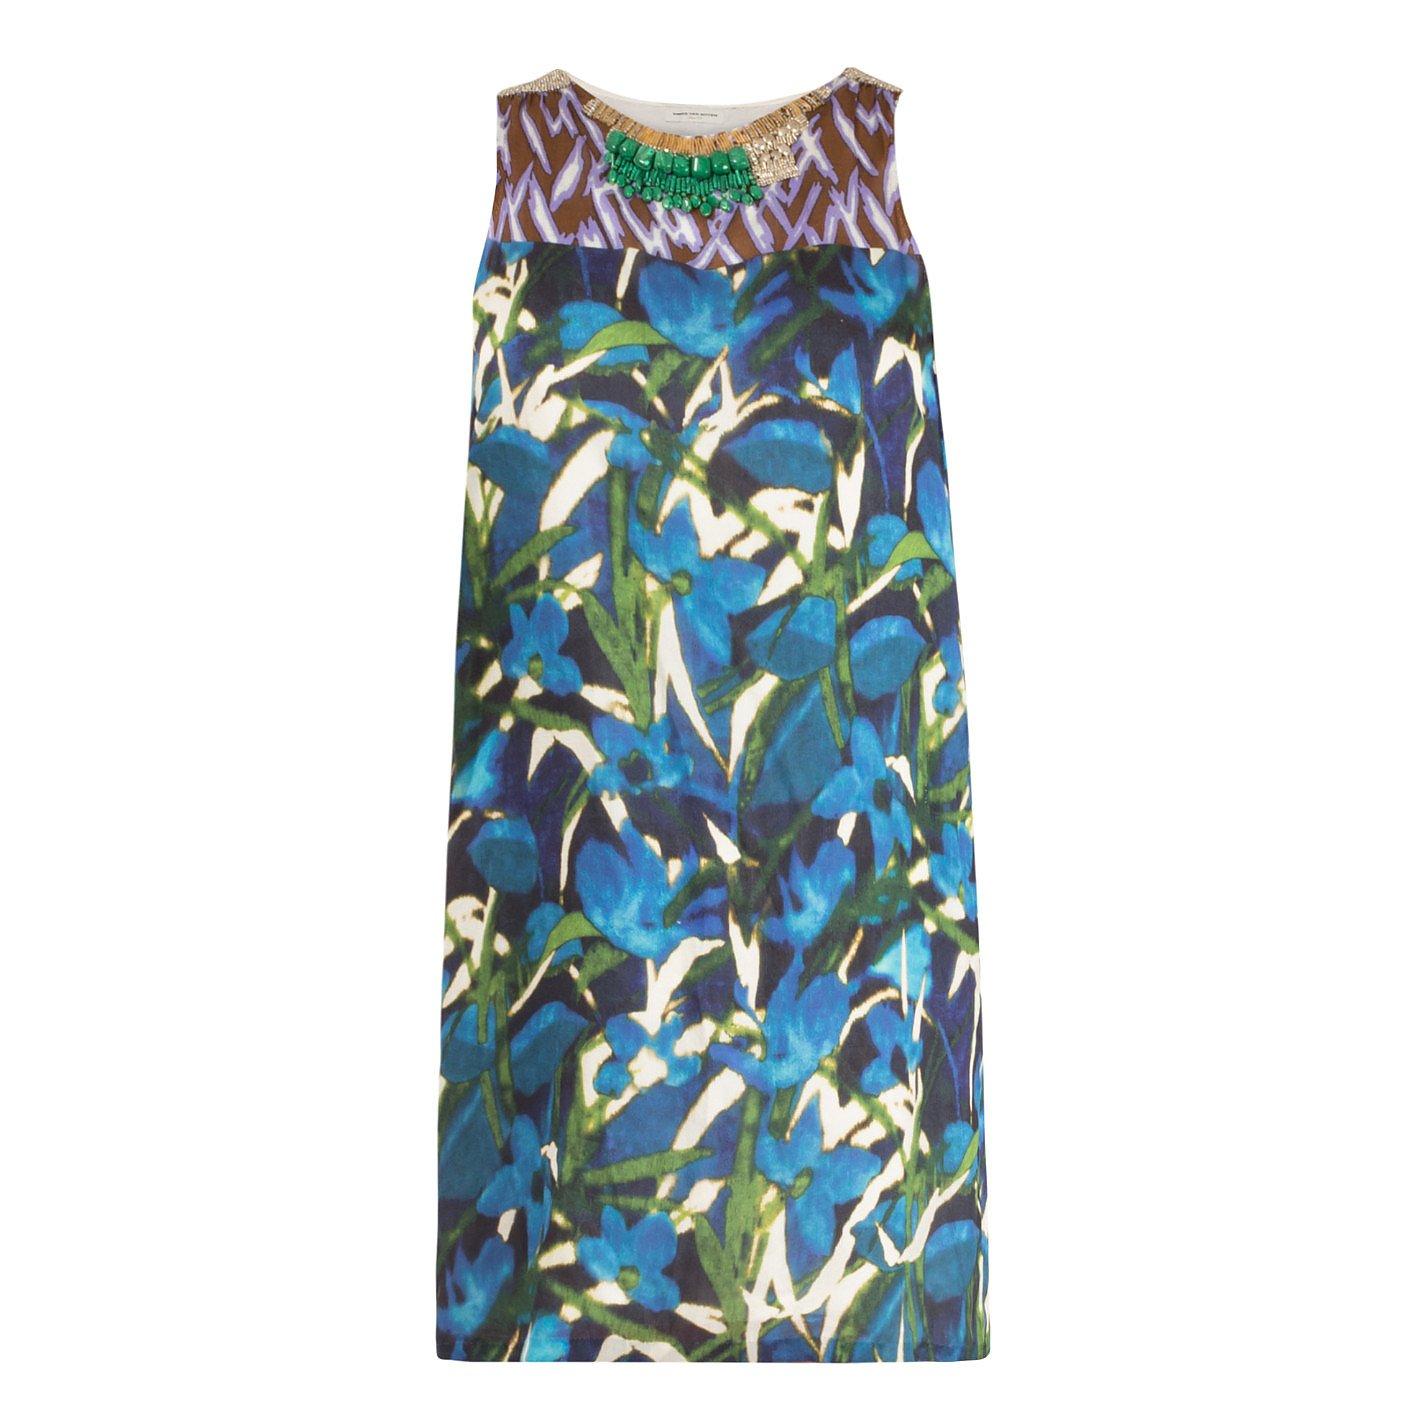 DRIES VAN NOTEN Embellished Printed Dress